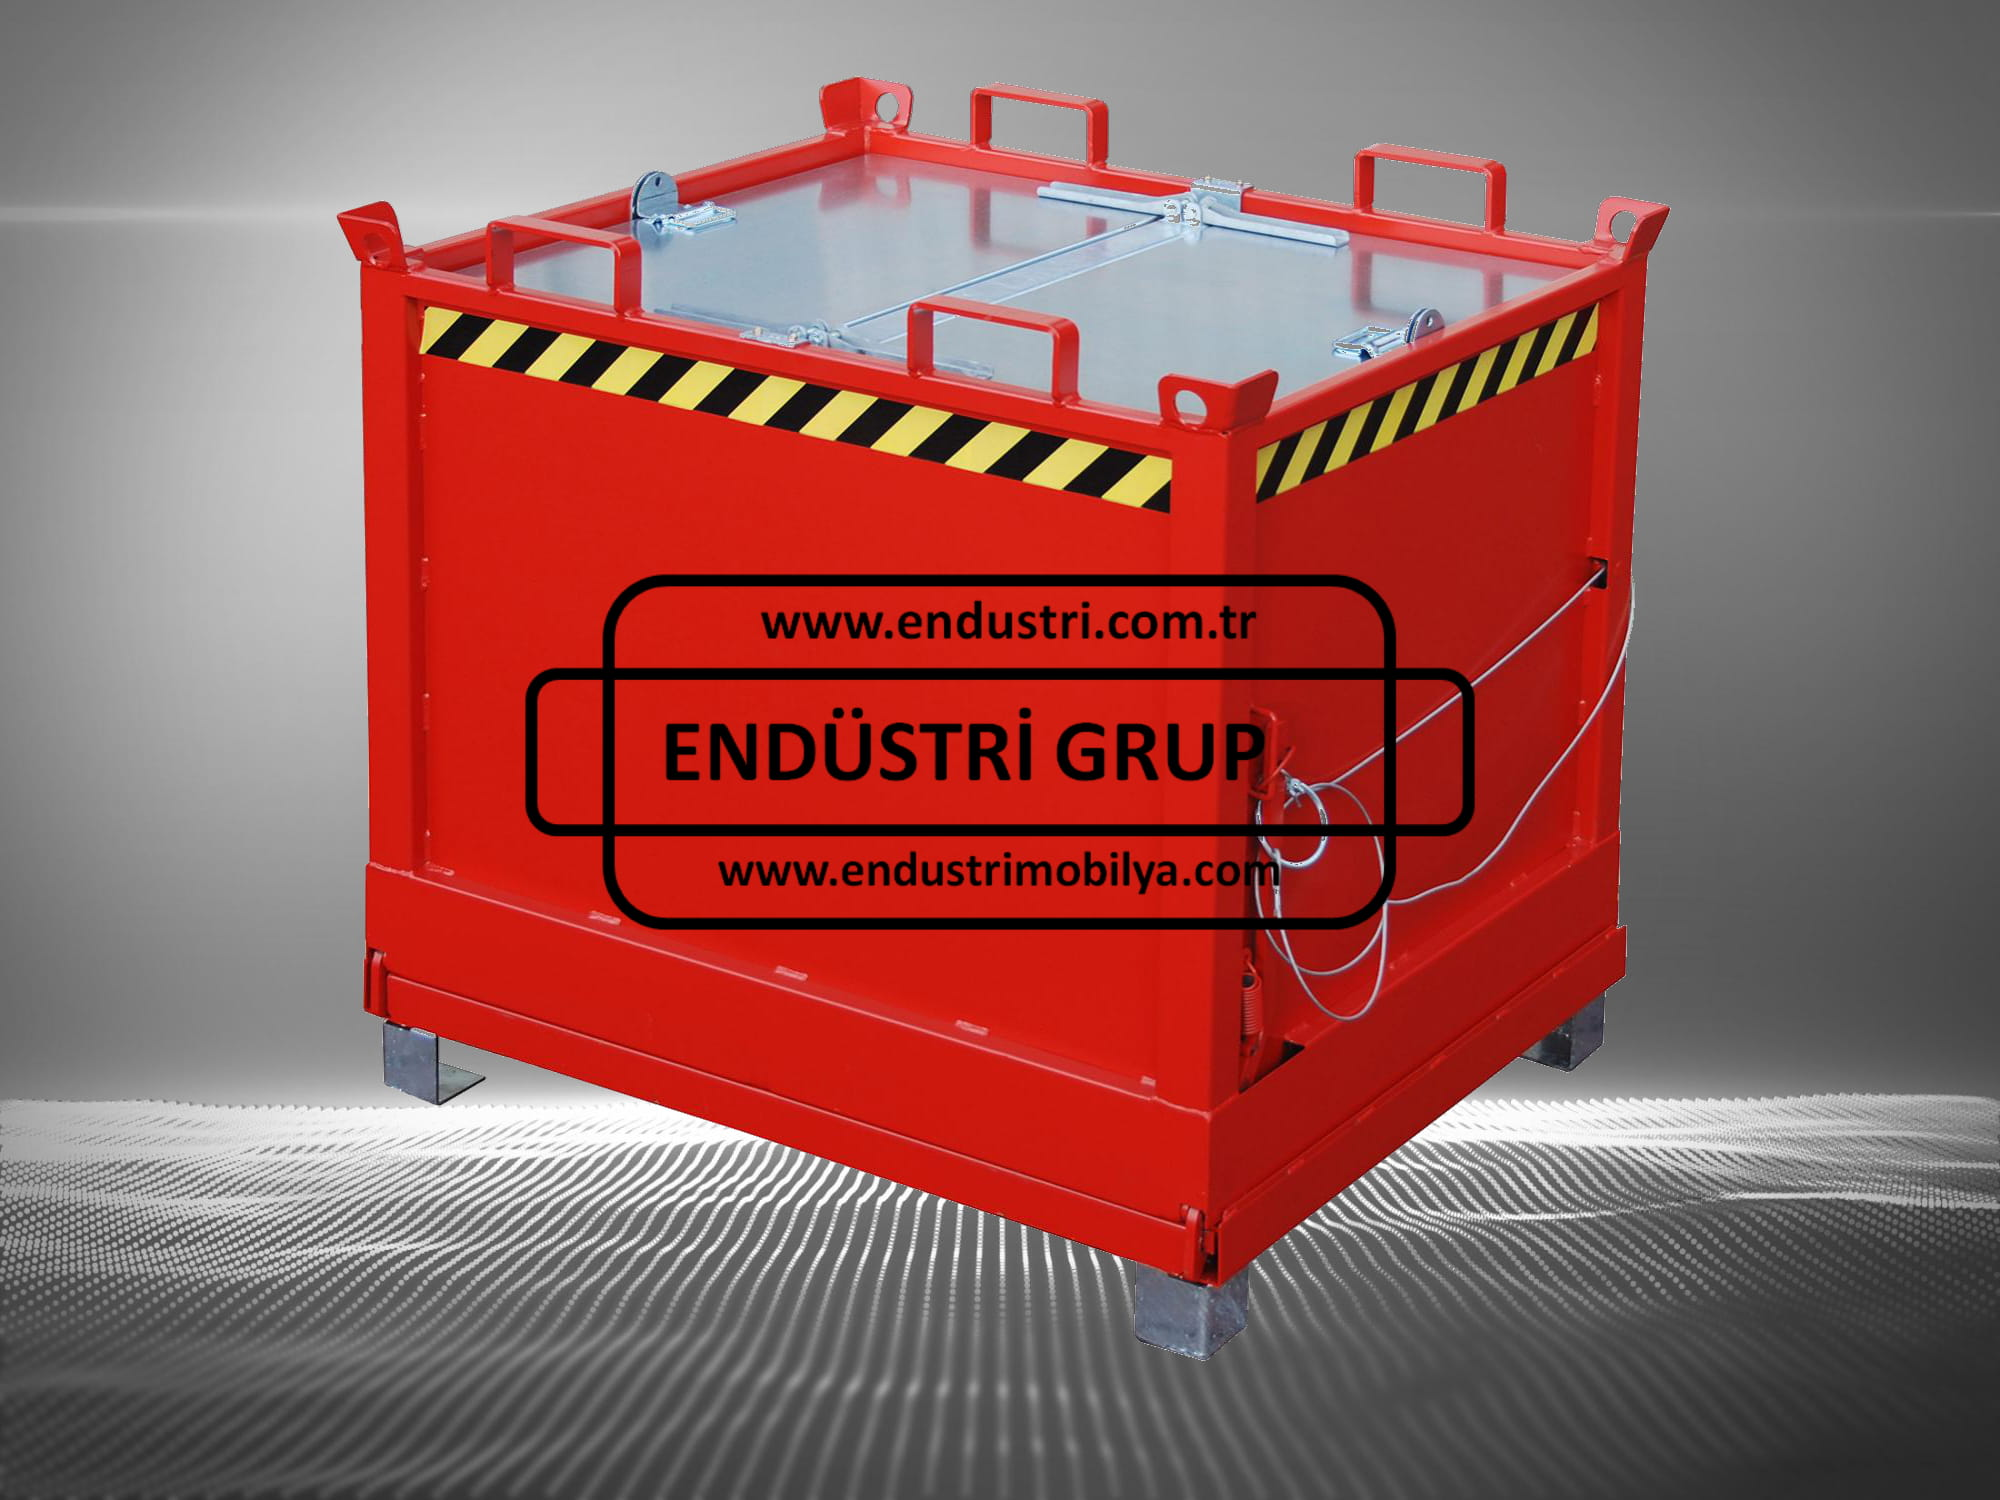 alttan-tabani-alti-konteynerlar-acilir-tabanli-konteyner-kasa